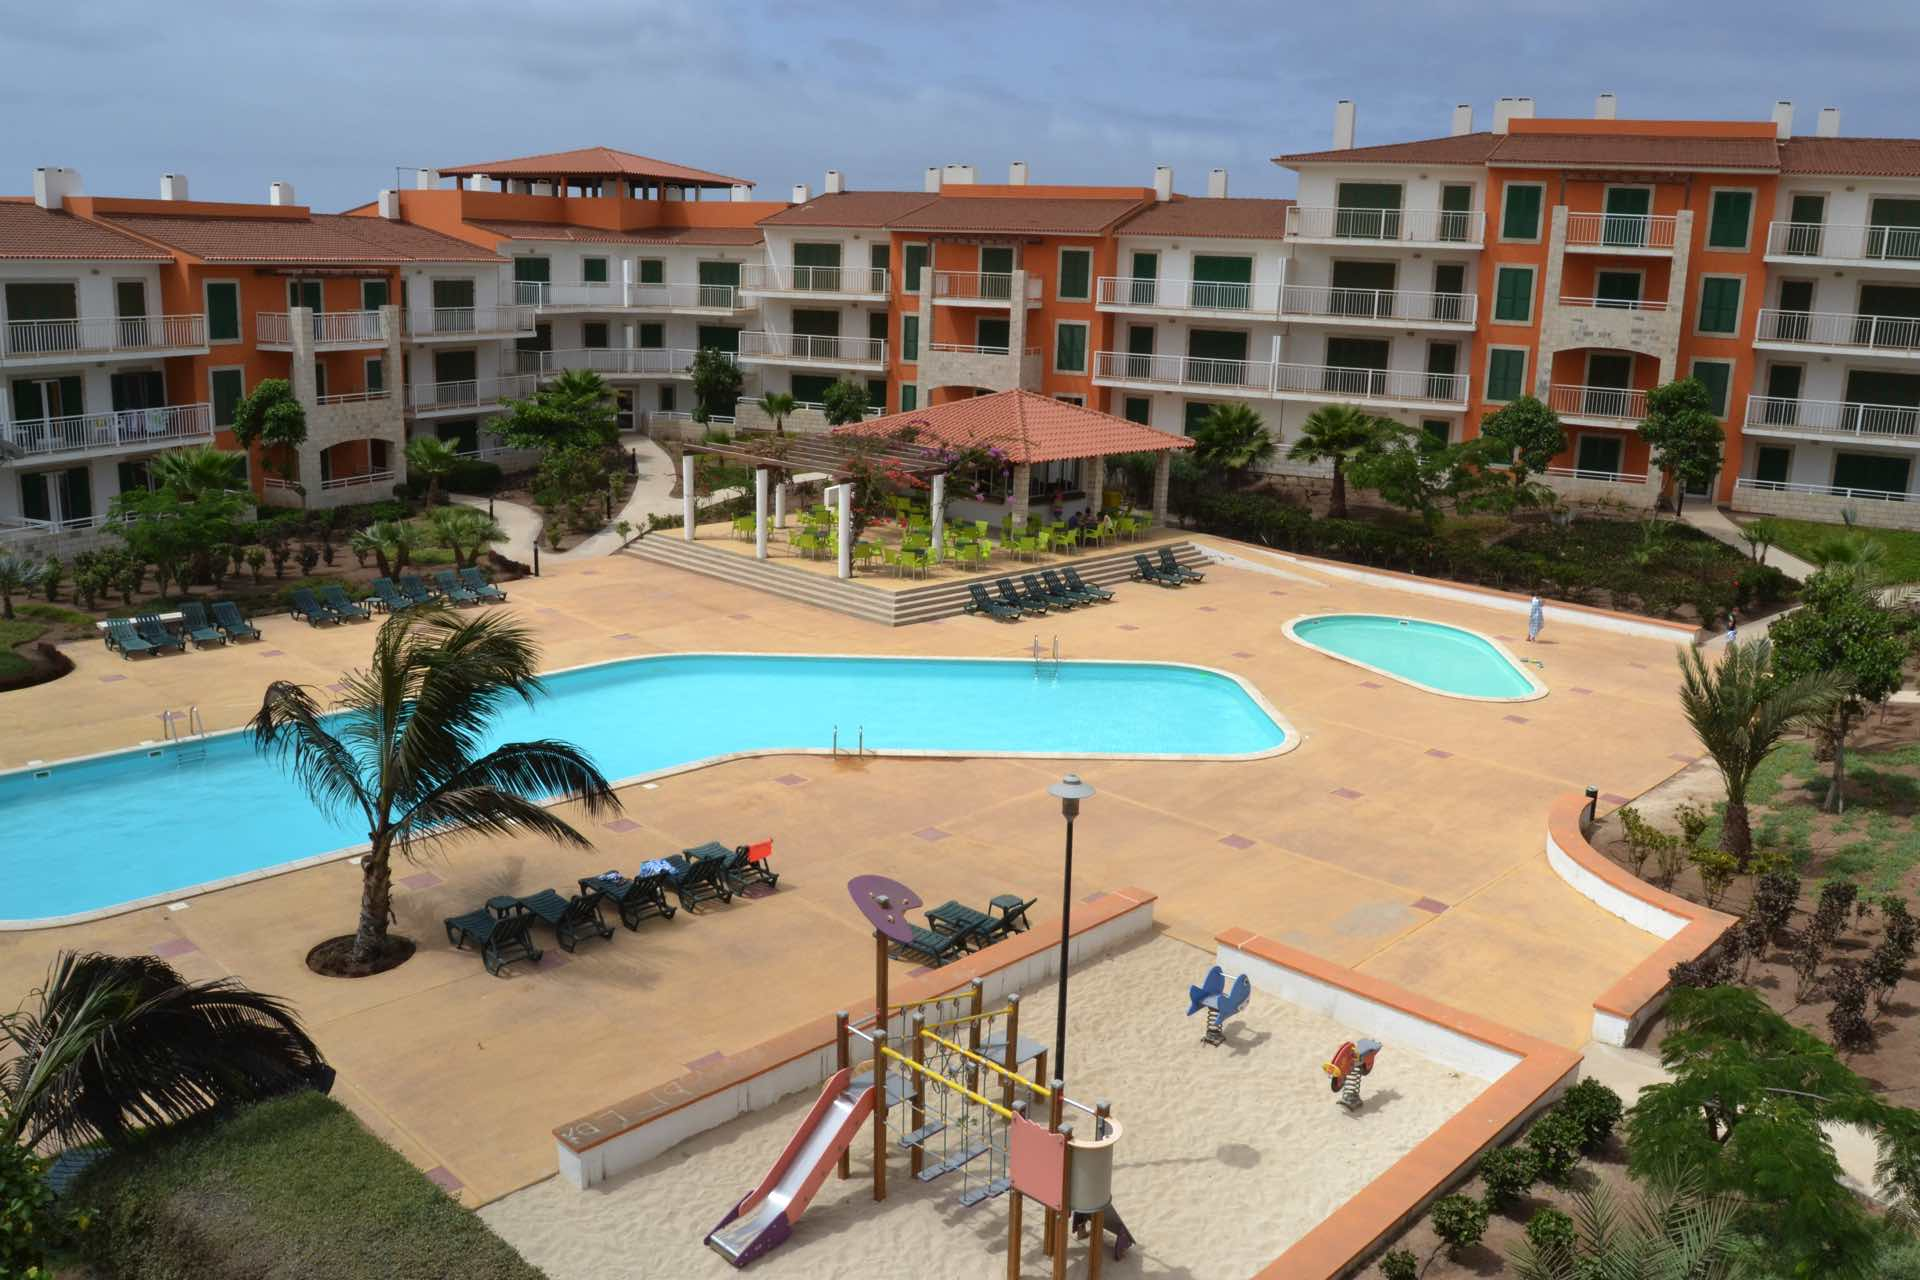 8 daagse vliegvakantie naar Agua Sal Vila Verde in santa maria, kaapverdische eilanden